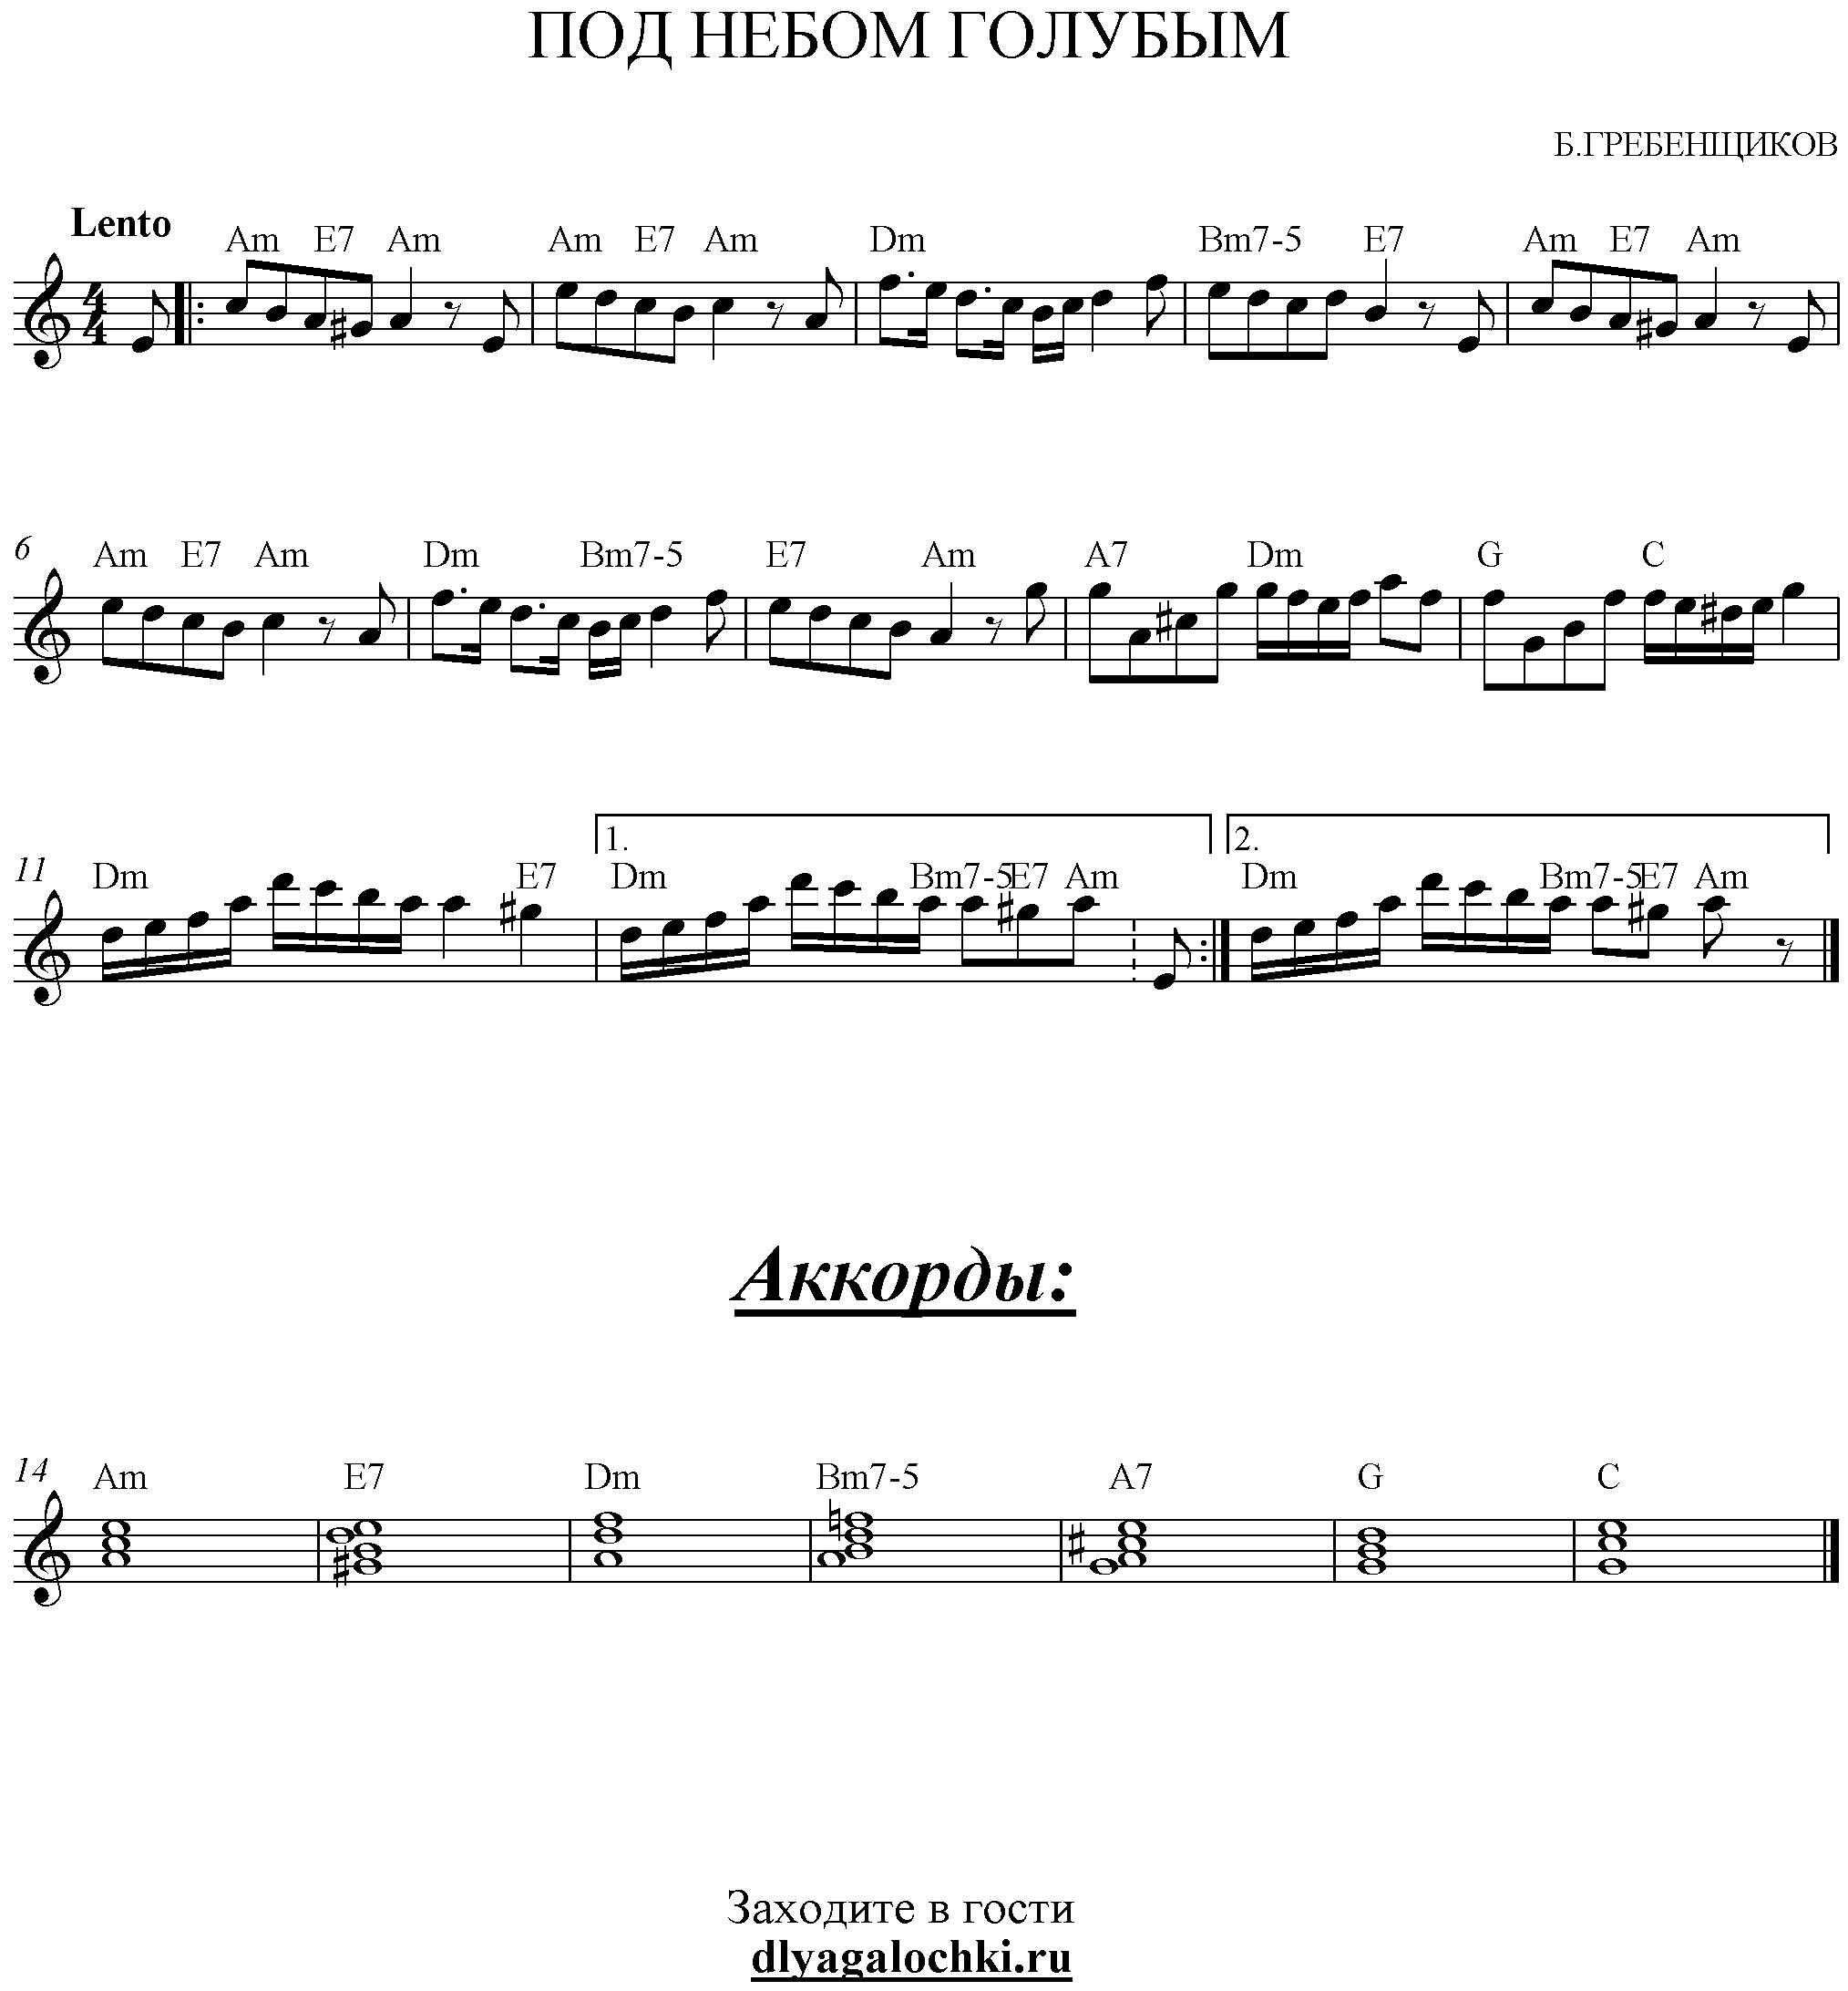 Pod Nebom Goluby M Png 2 028 2 185 Piks Pesni Fortepiano Noty Uroki Muzyki